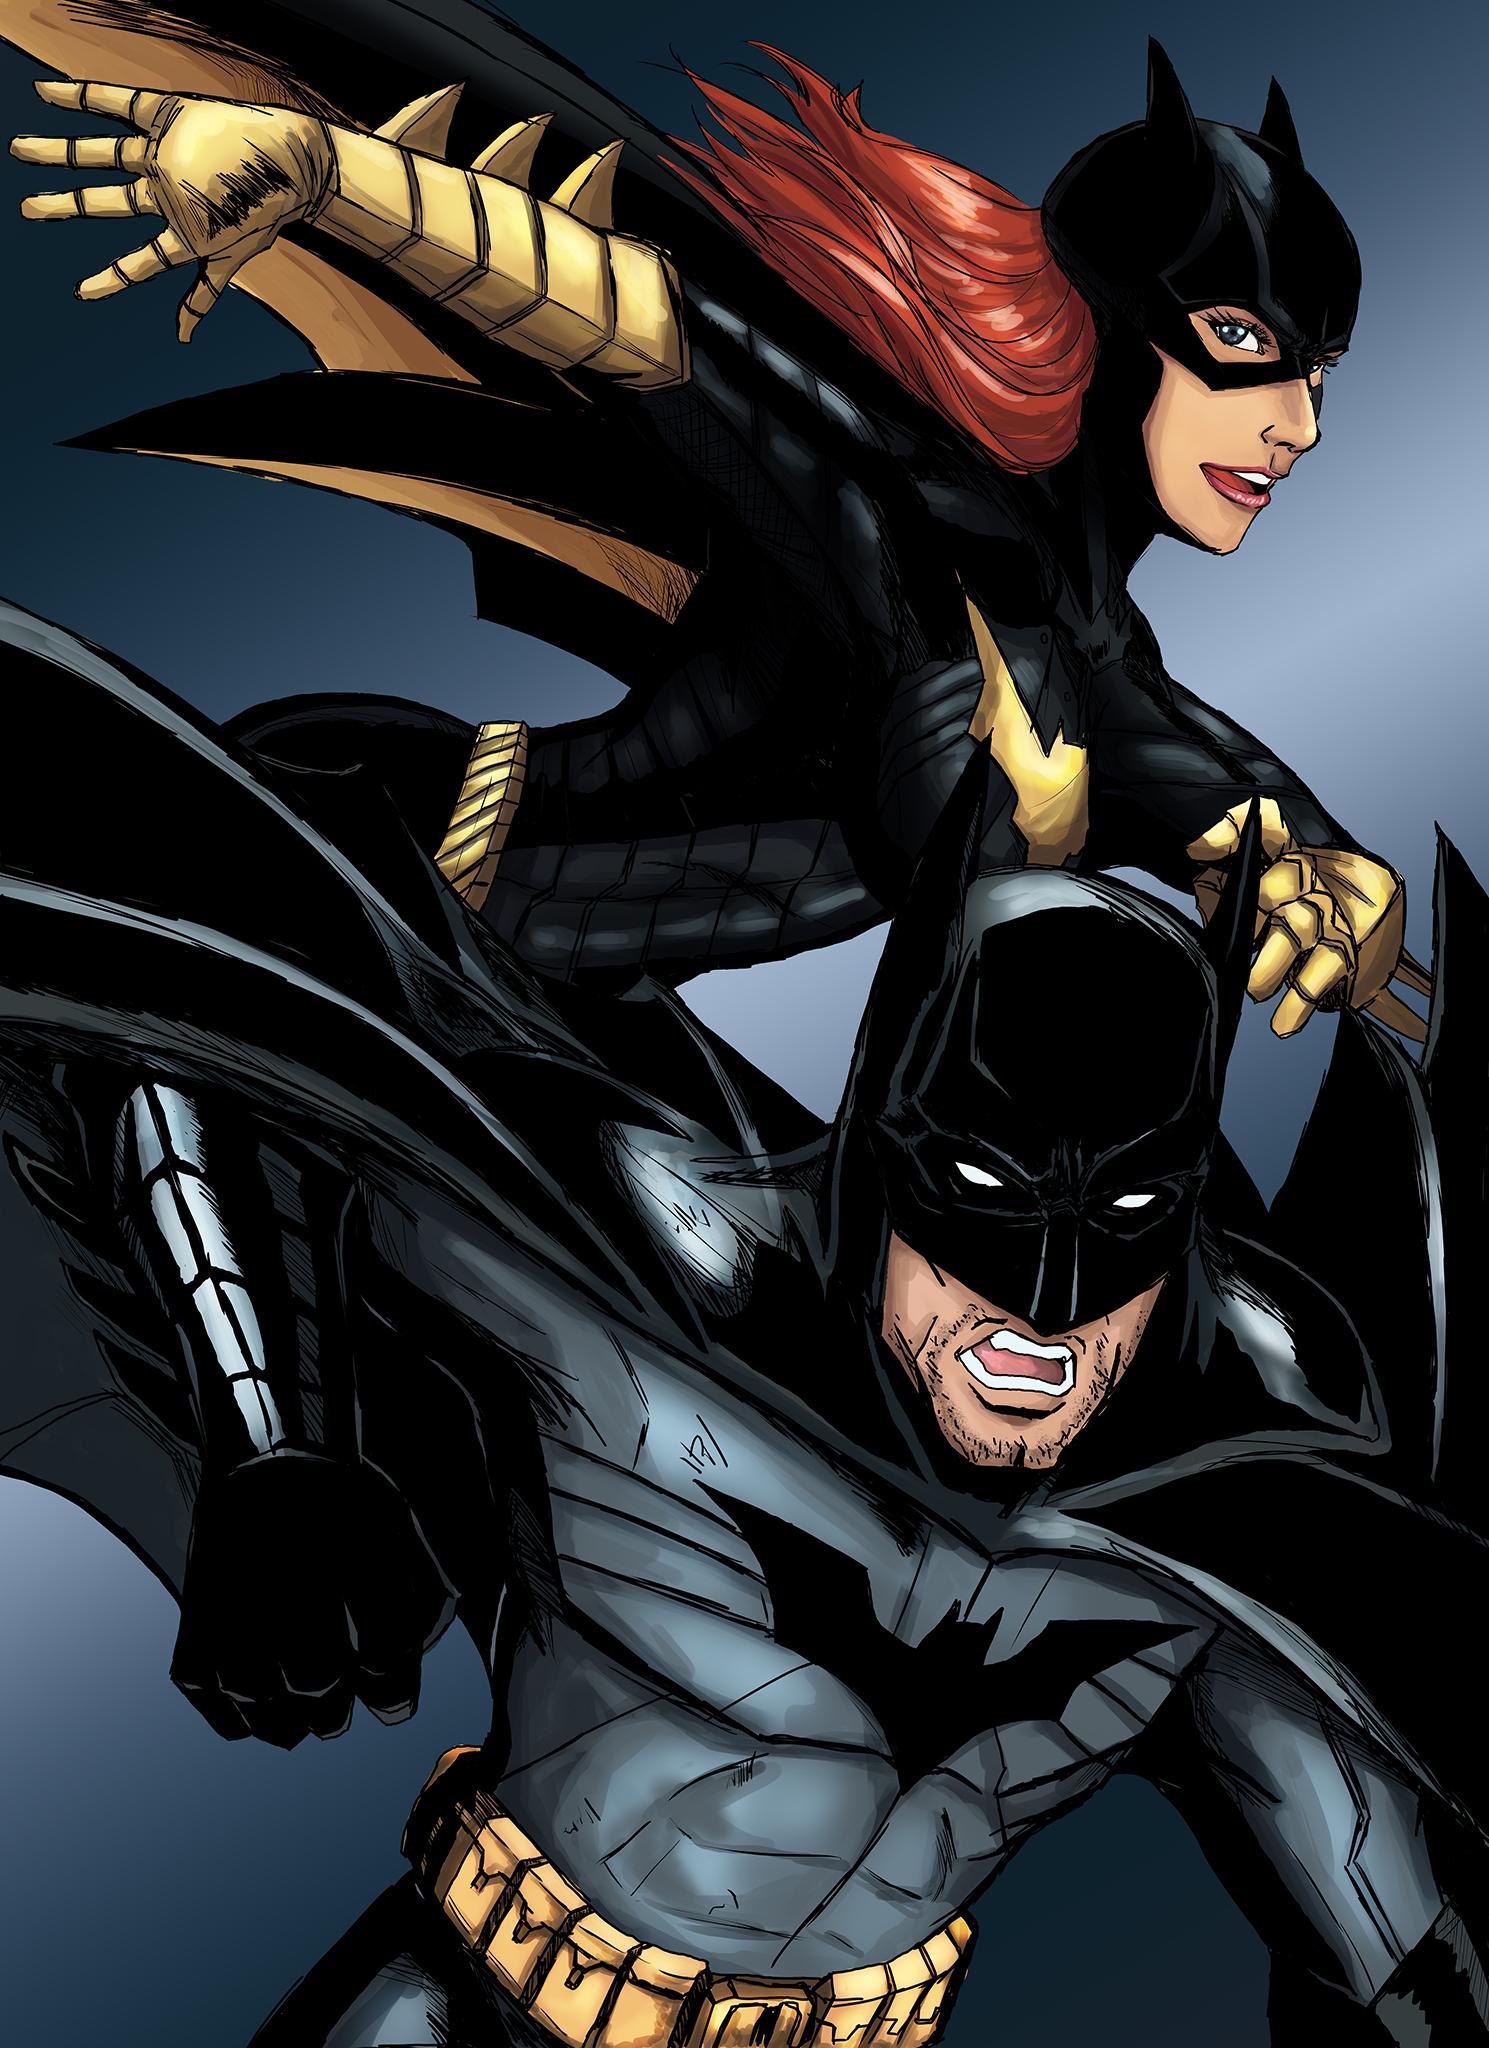 Batman/Batgirl by cpuhuman on DeviantArt